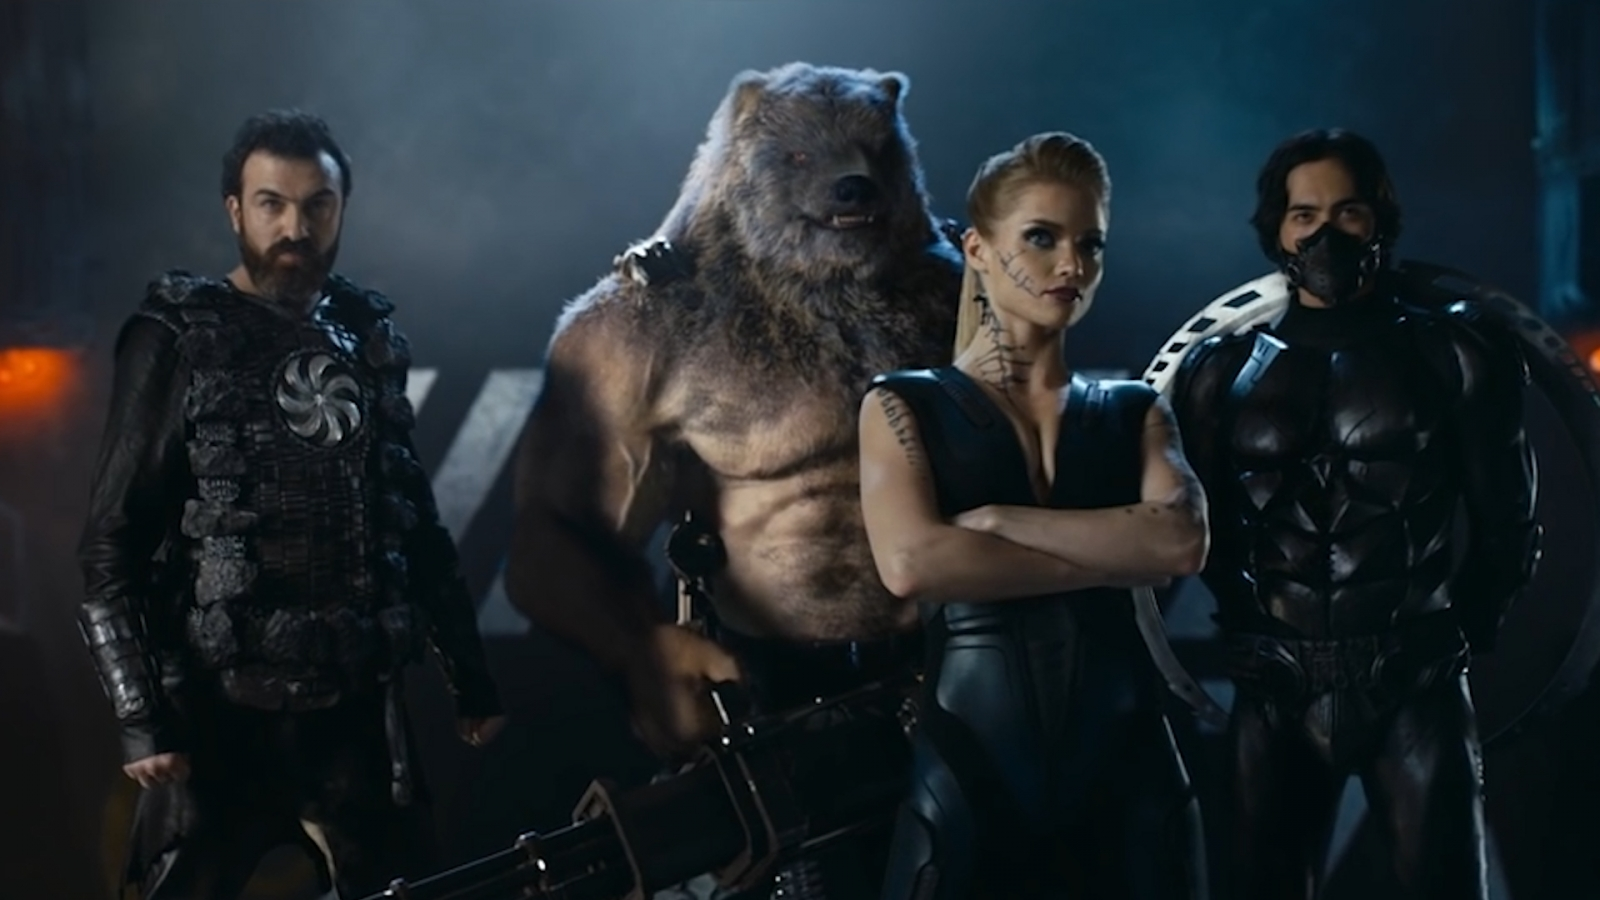 Russian superhero movie featuring machine-gun-wielding bear strongly resembles Marvel's Avengers